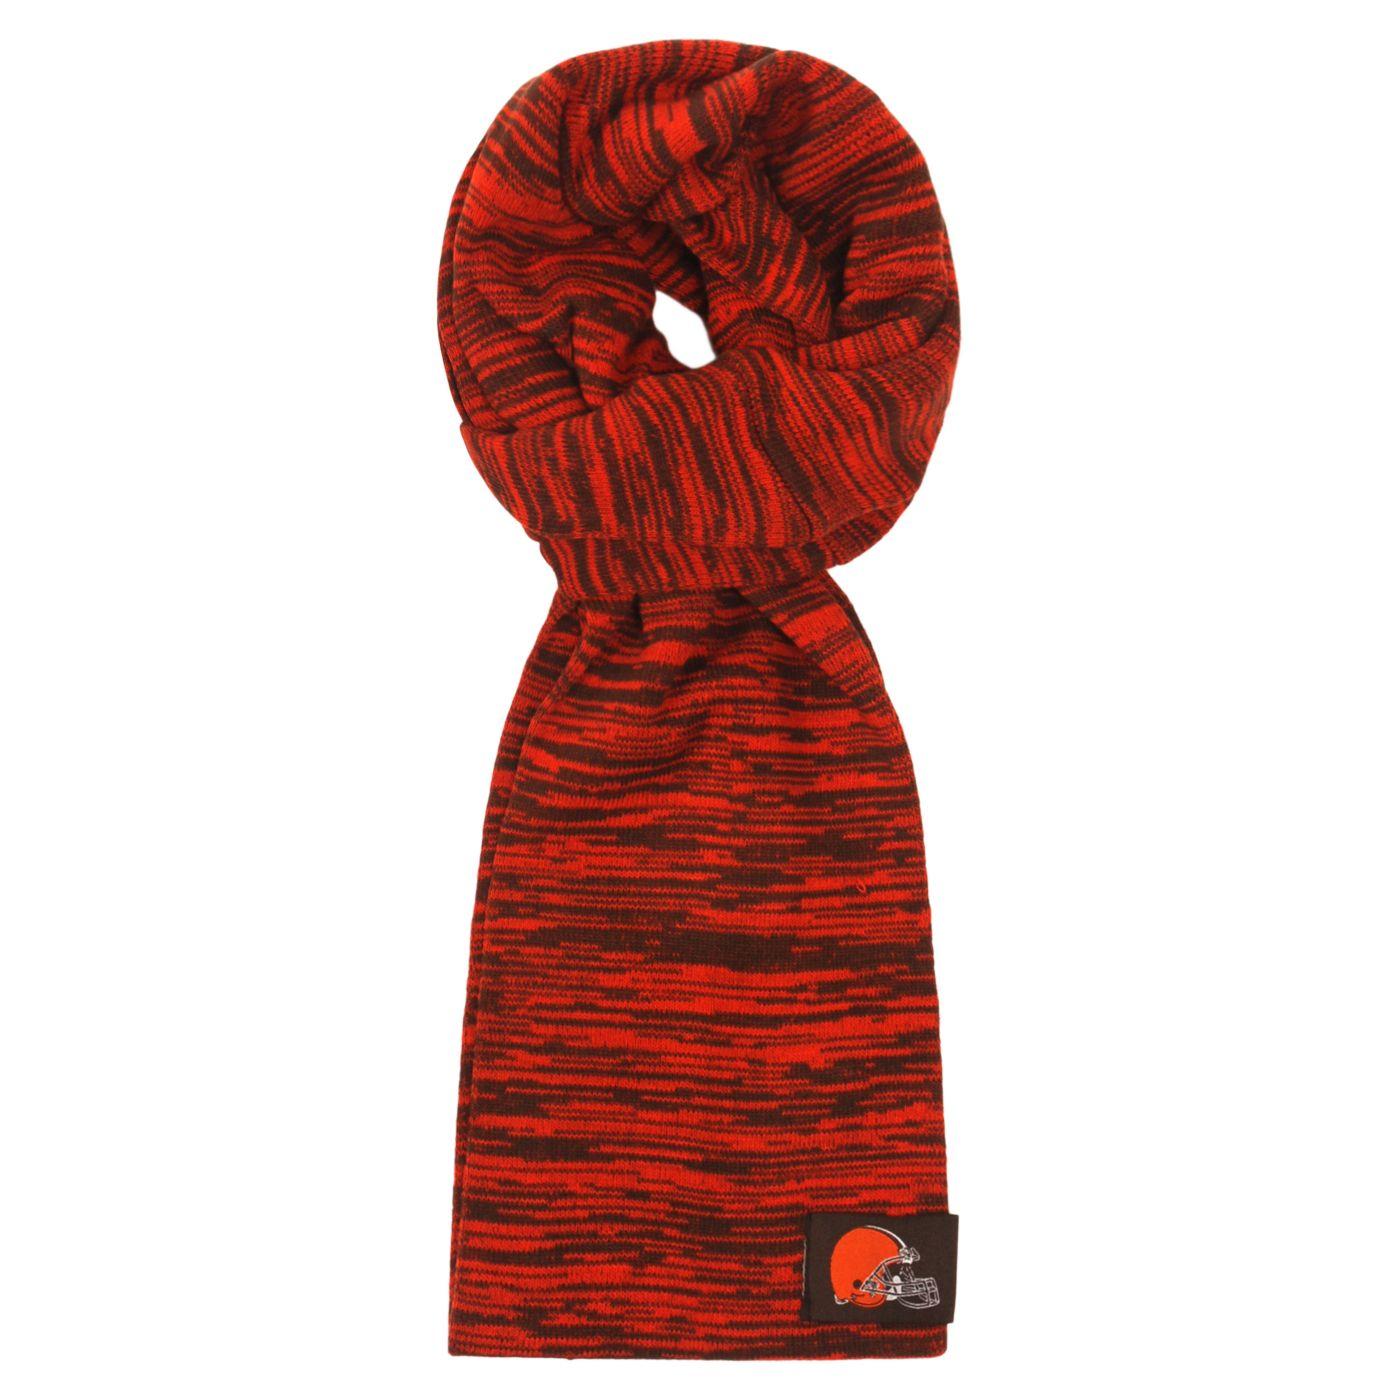 FOCO Cleveland Browns Color Blend Scarf